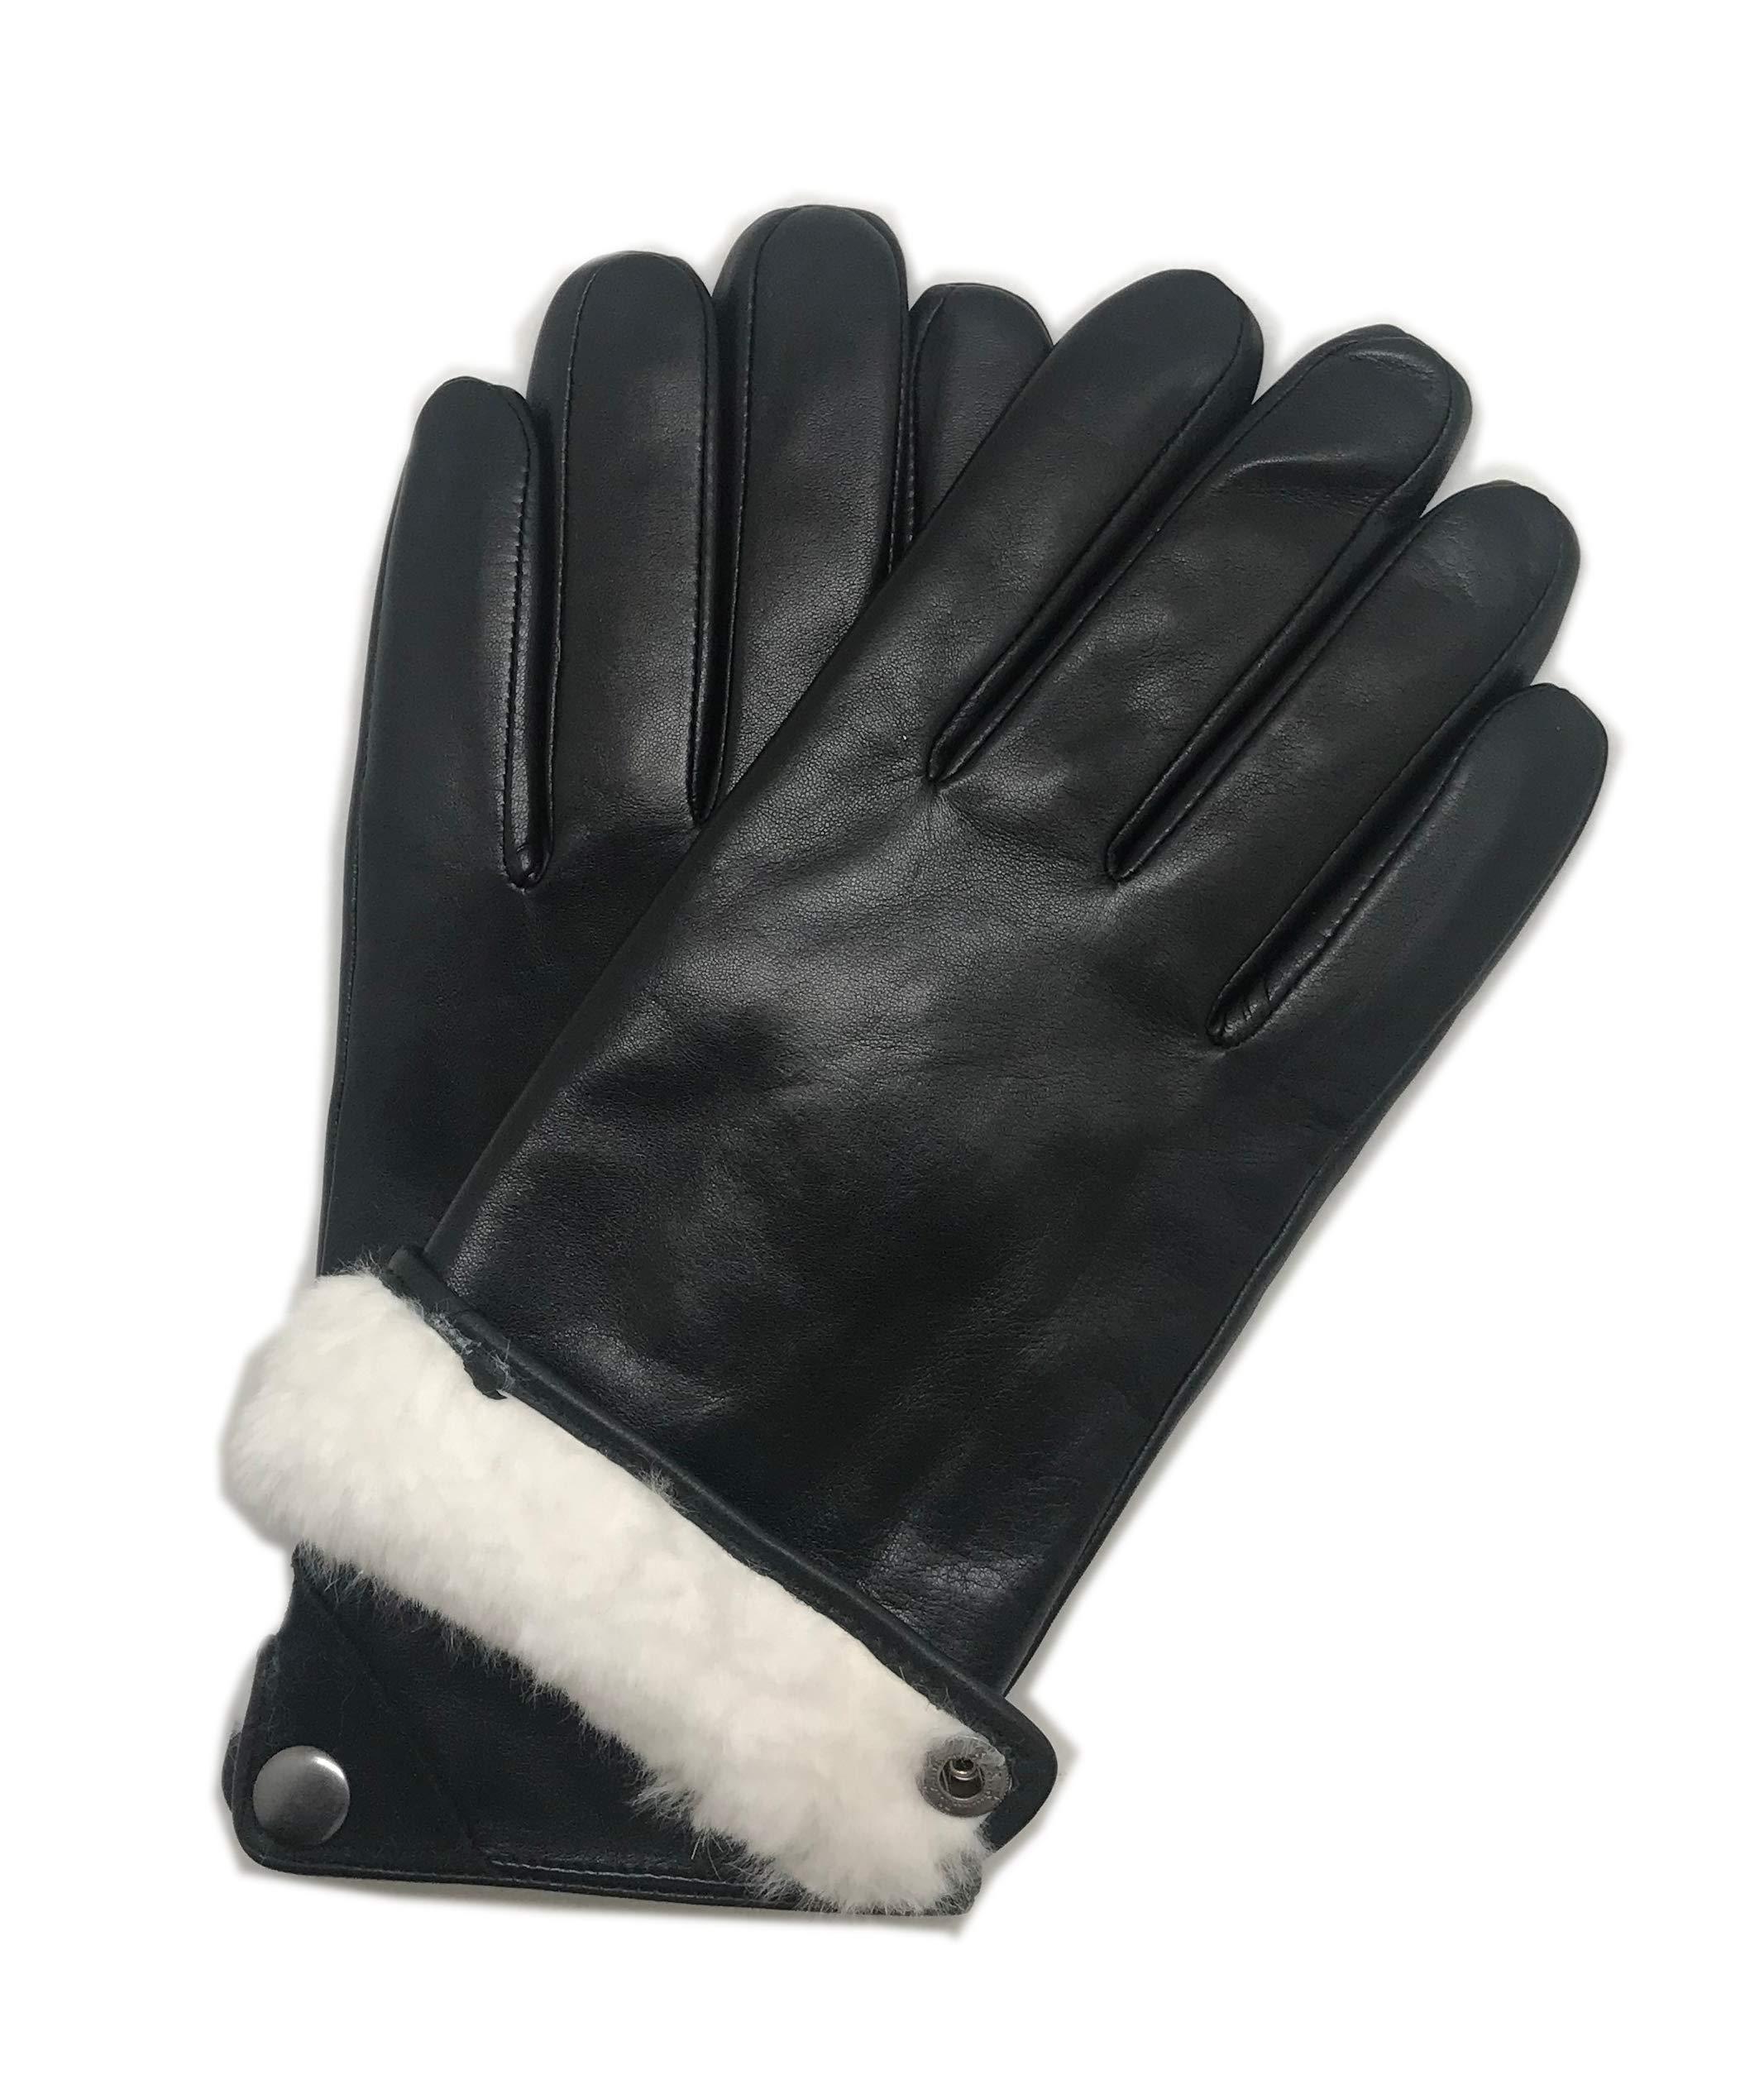 YISEVEN Men's Winter Touchscreen Sheepskin Drees Leather Gloves Handsewn